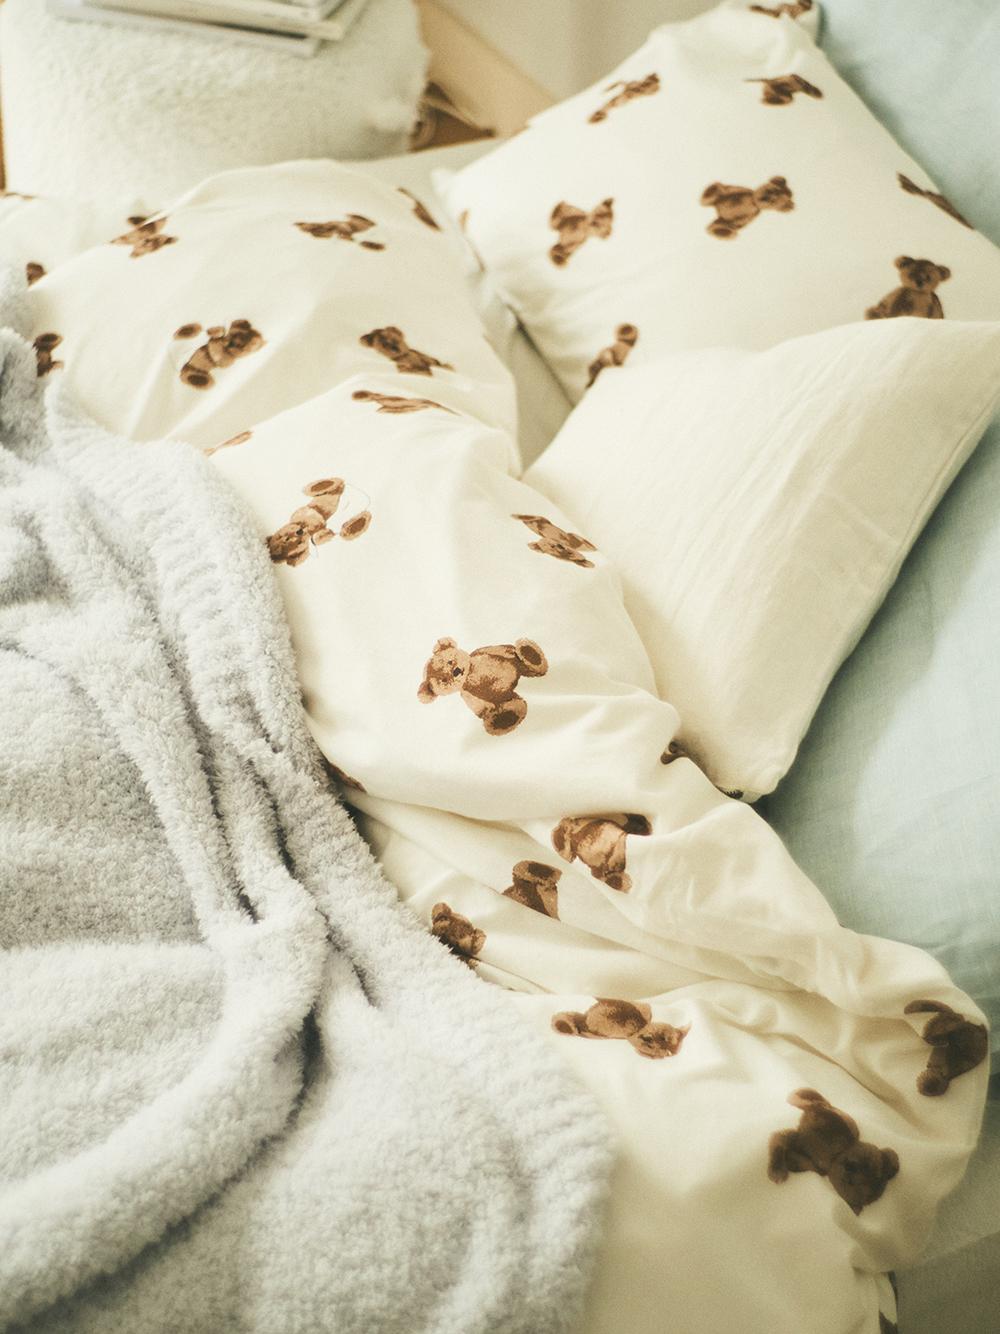 【Sleep】(ダブル)ベアモチーフ掛け布団カバー | PSGG211036